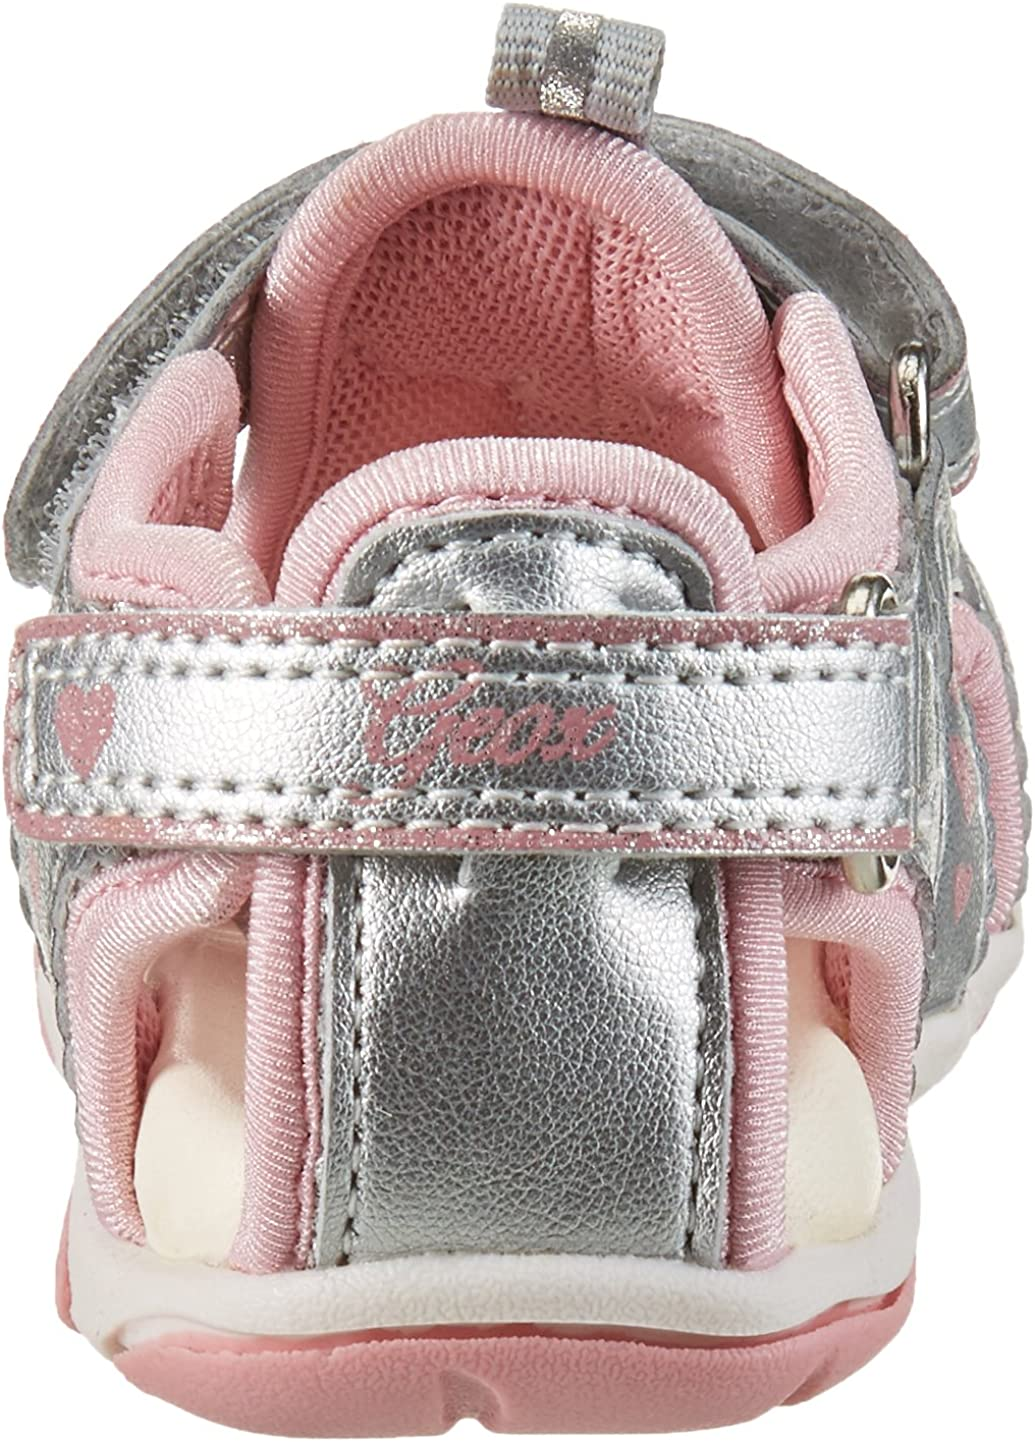 Chaussures Marche b/éb/é Fille Geox B Sandal Agasim Girl C